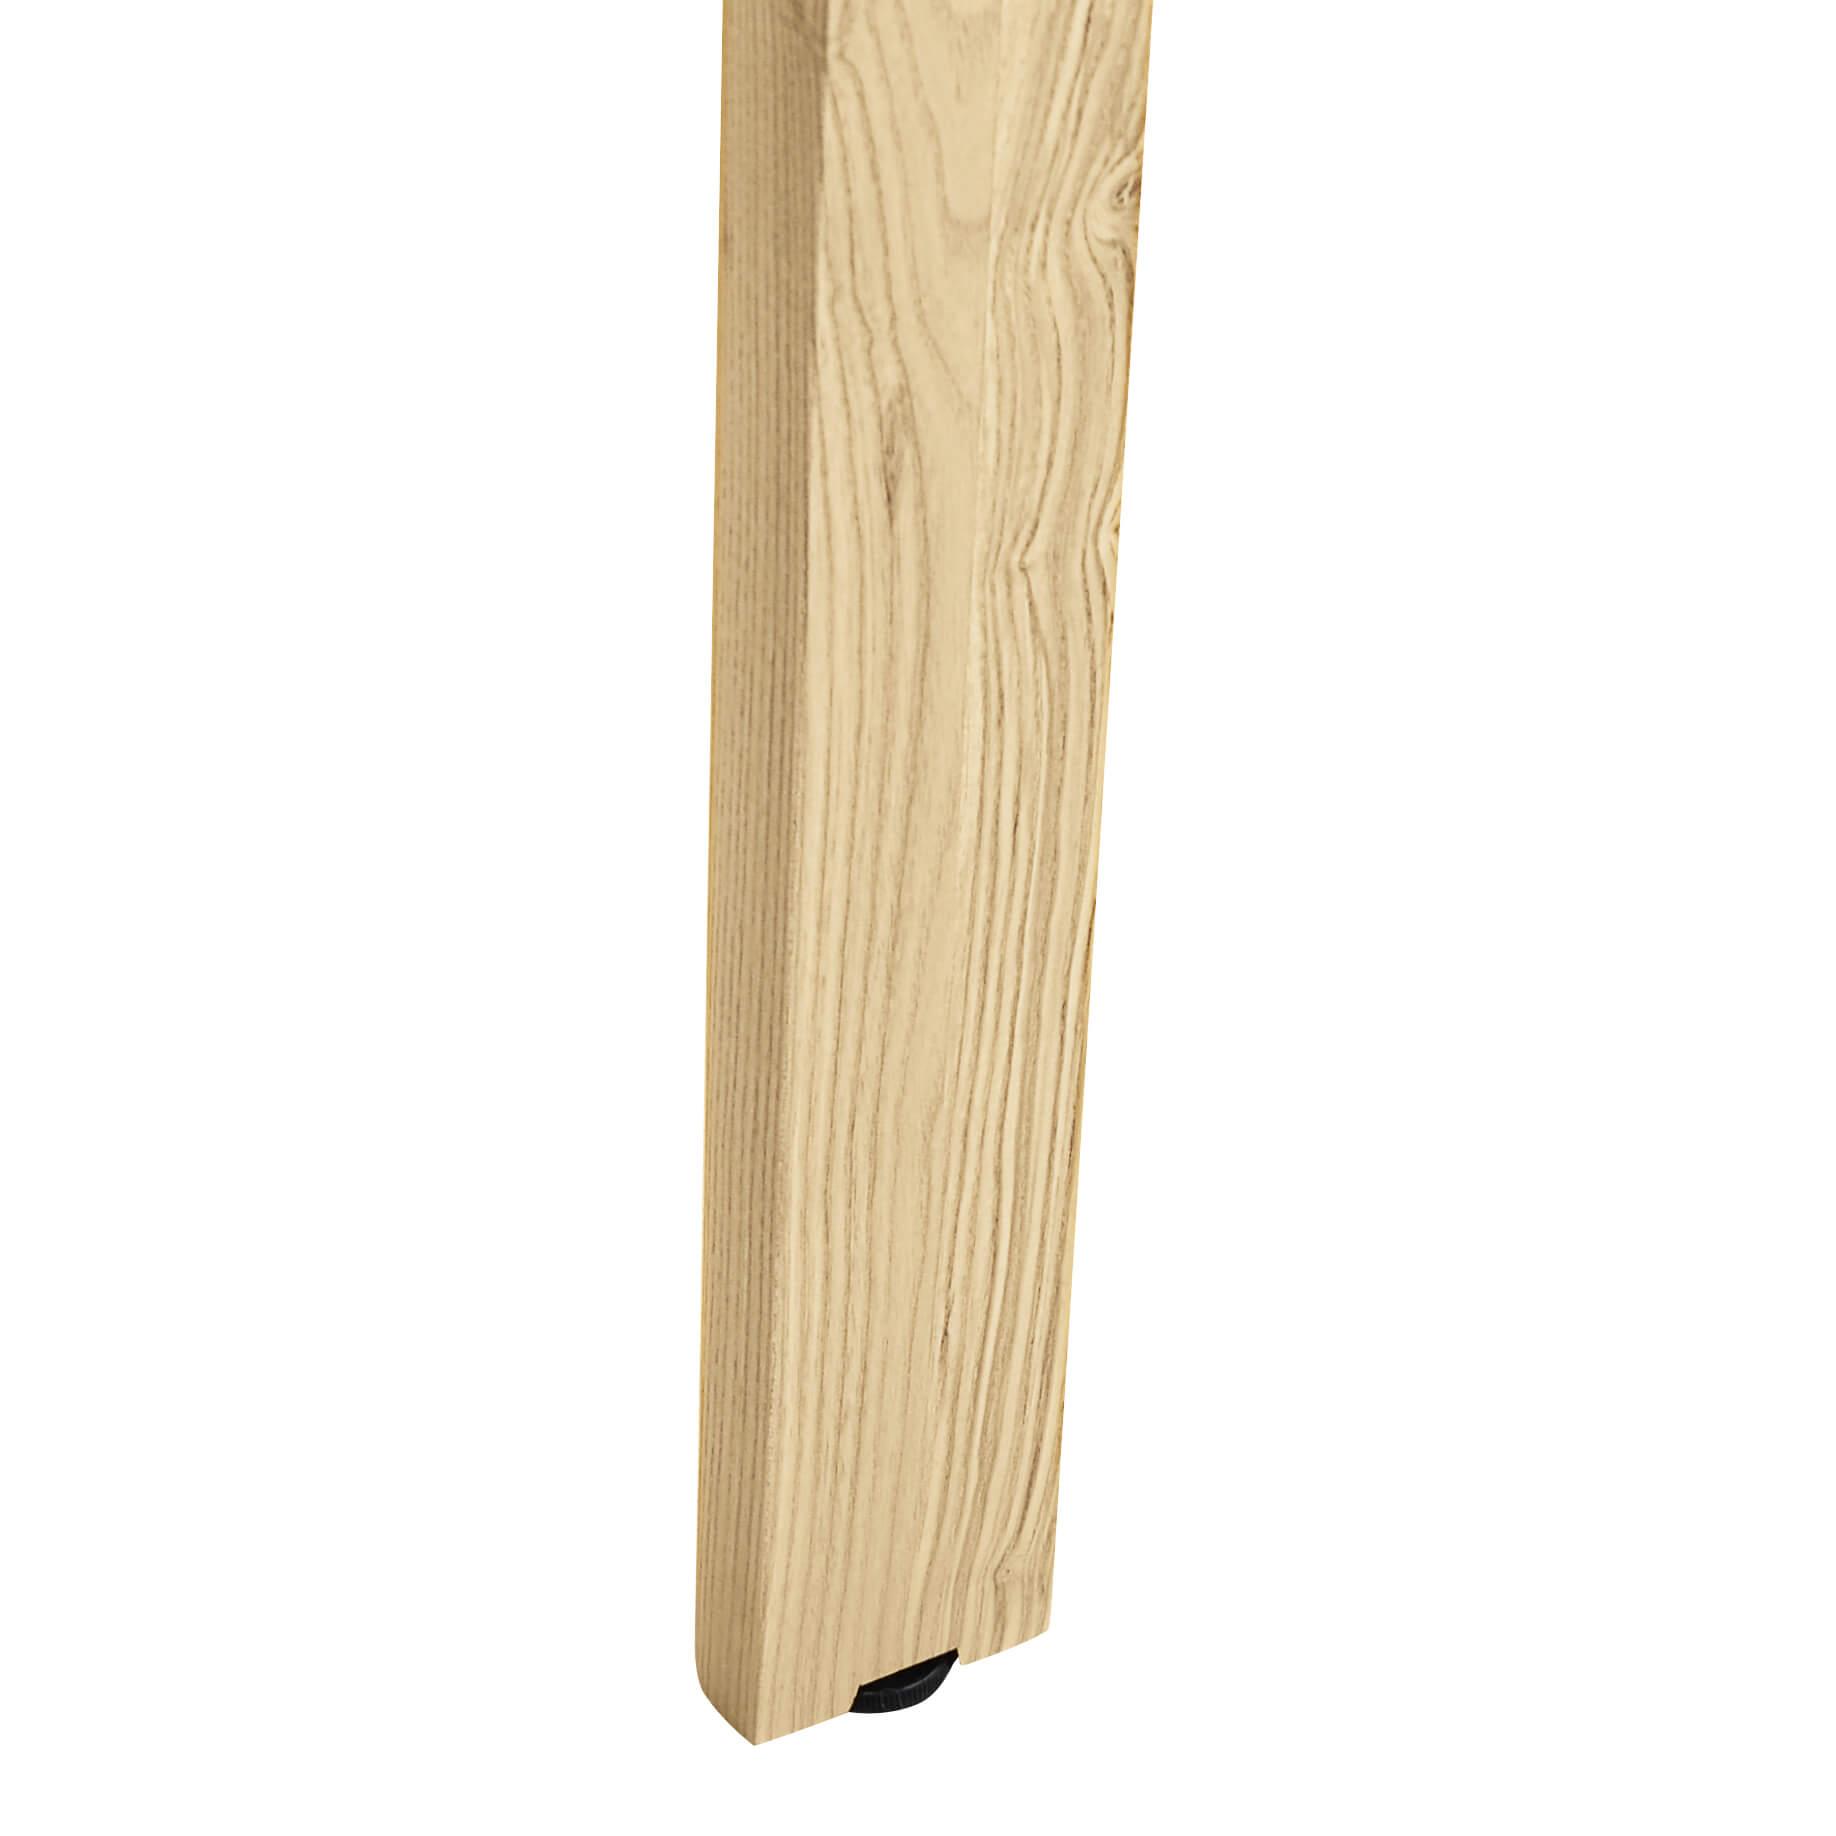 Konferenztisch NOVA Wood 280 x 120 cm Weiß/Holz Meeting Bürotisch